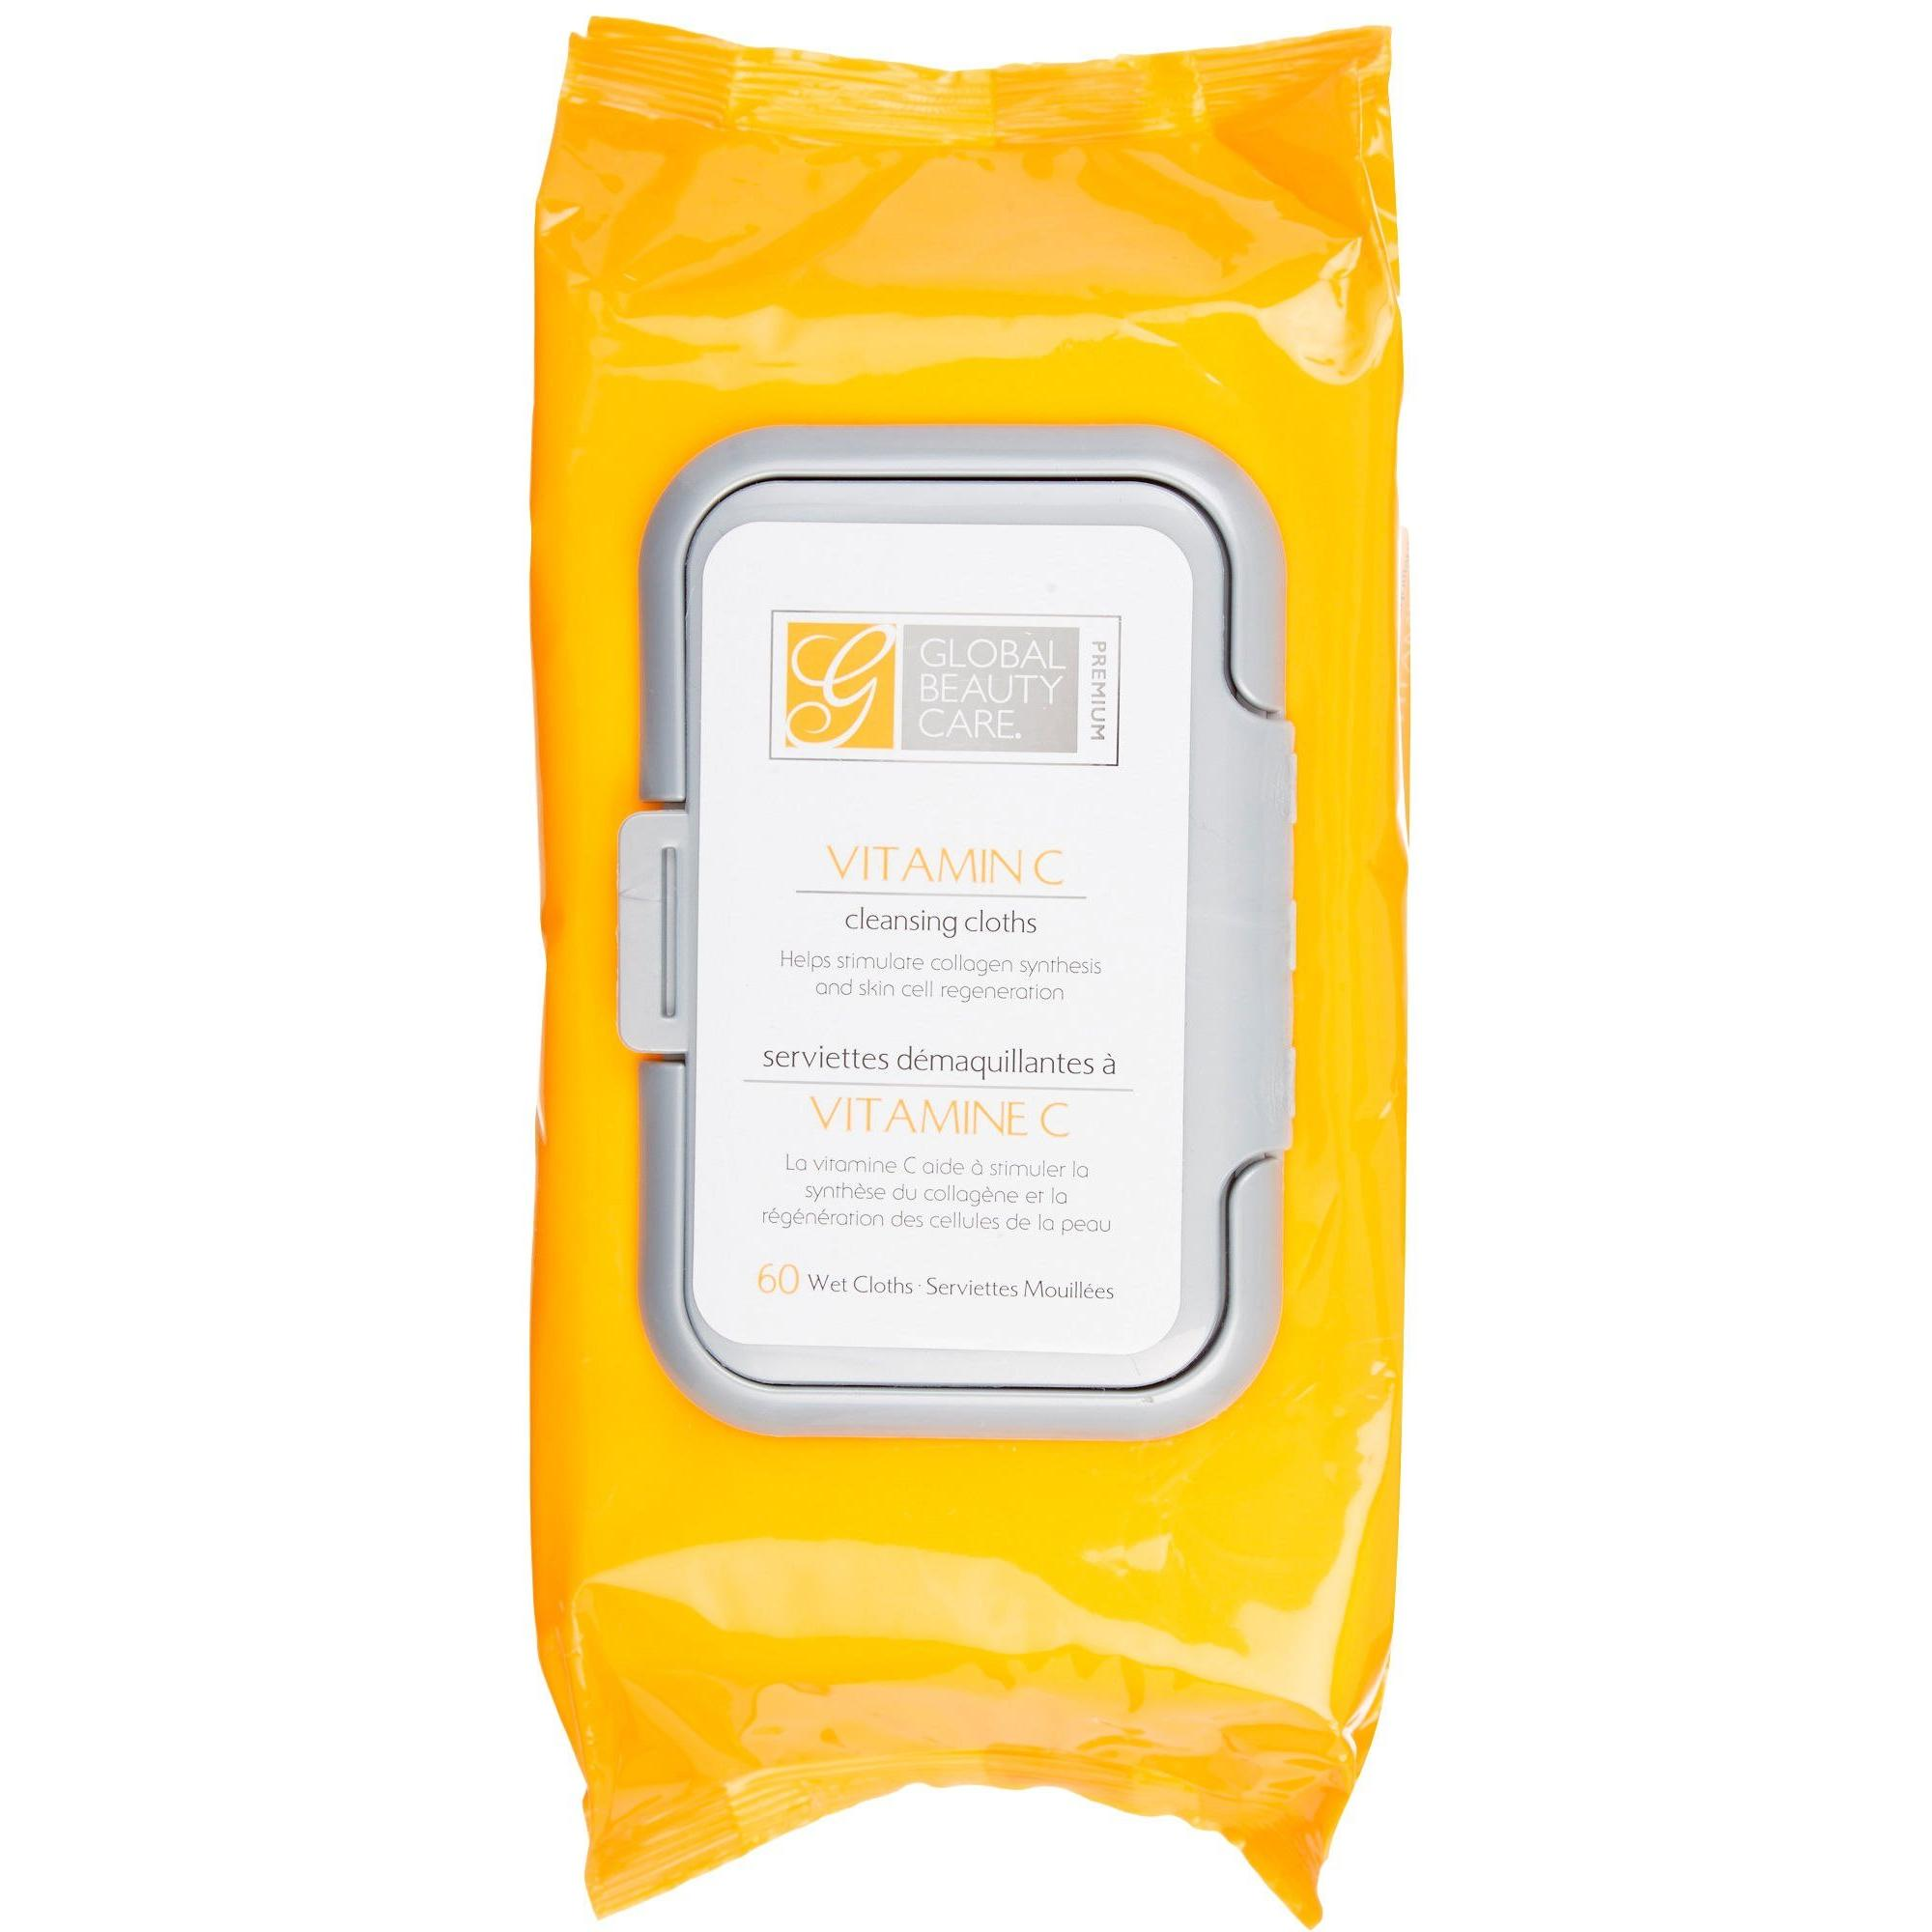 Global - Beauty Care Premium Vitamin C Cloths